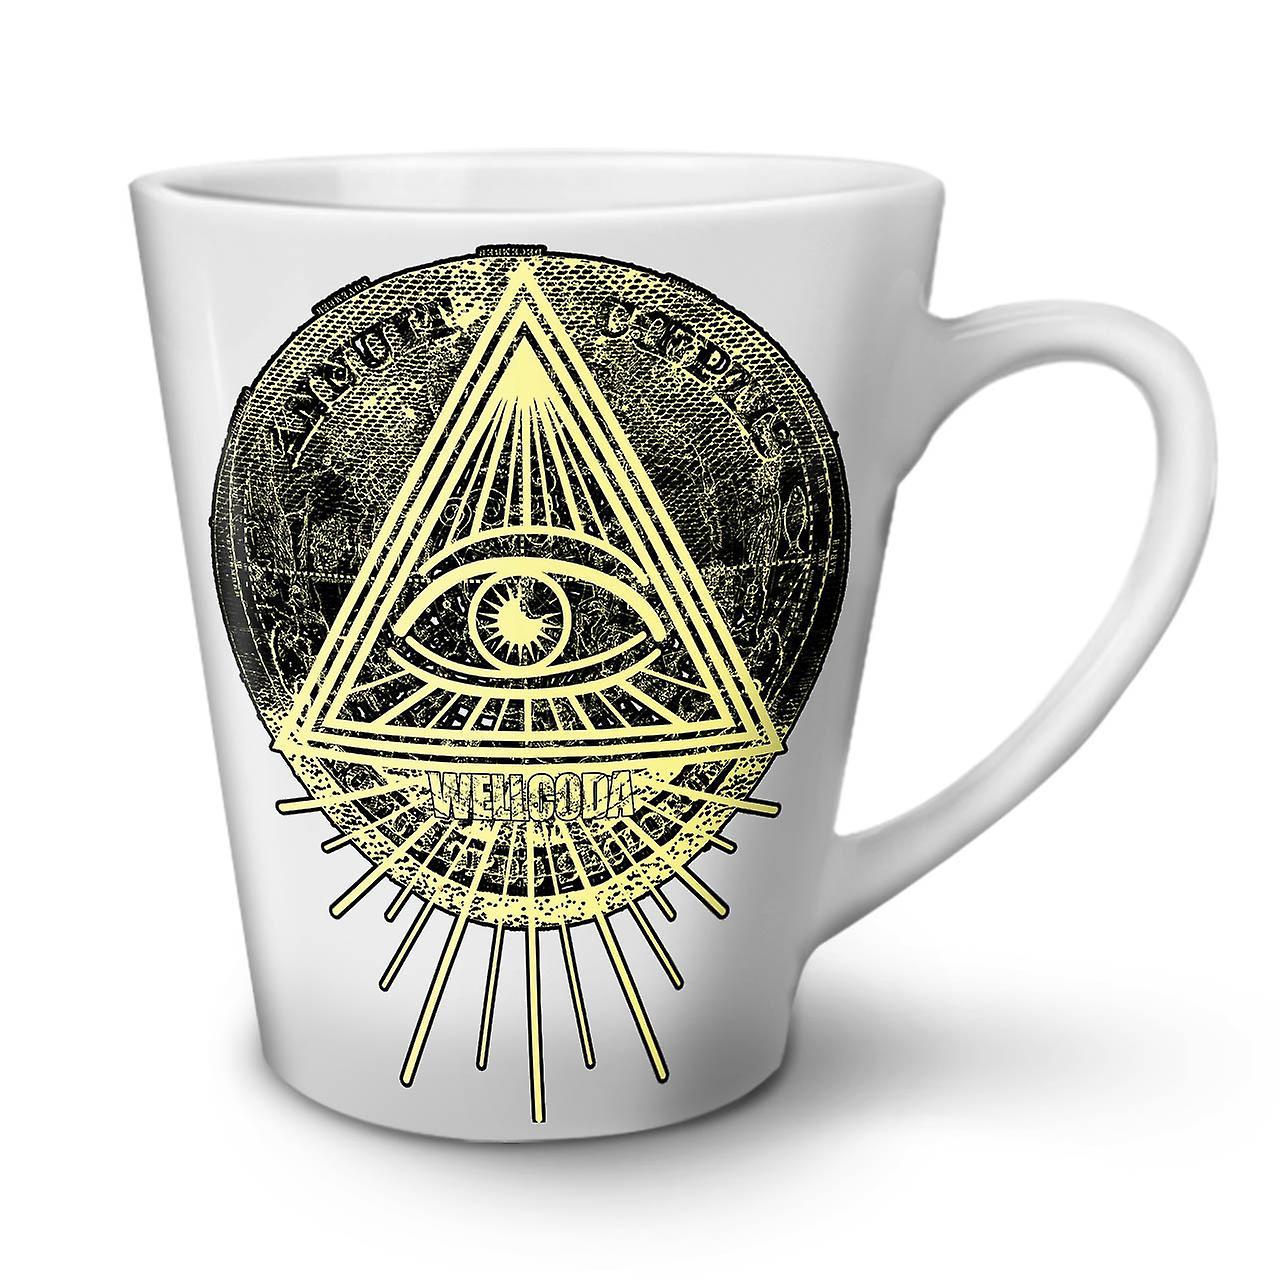 Coffee Mug New White Triangle Tea 12 OzWellcoda Ceramic Latte UpGMVLzqS